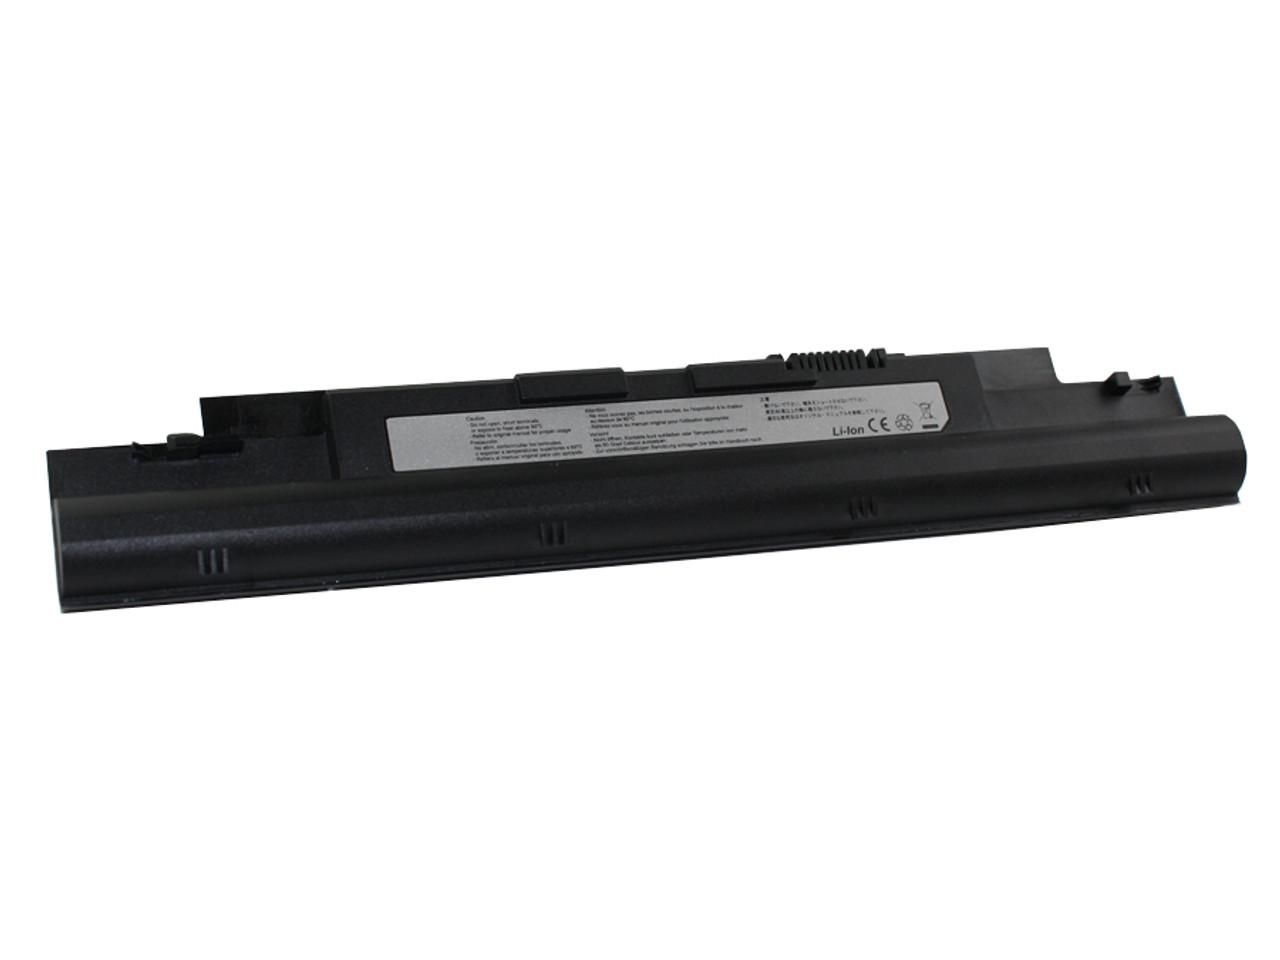 Dell Vostro V131, Inspiron 14Z battery